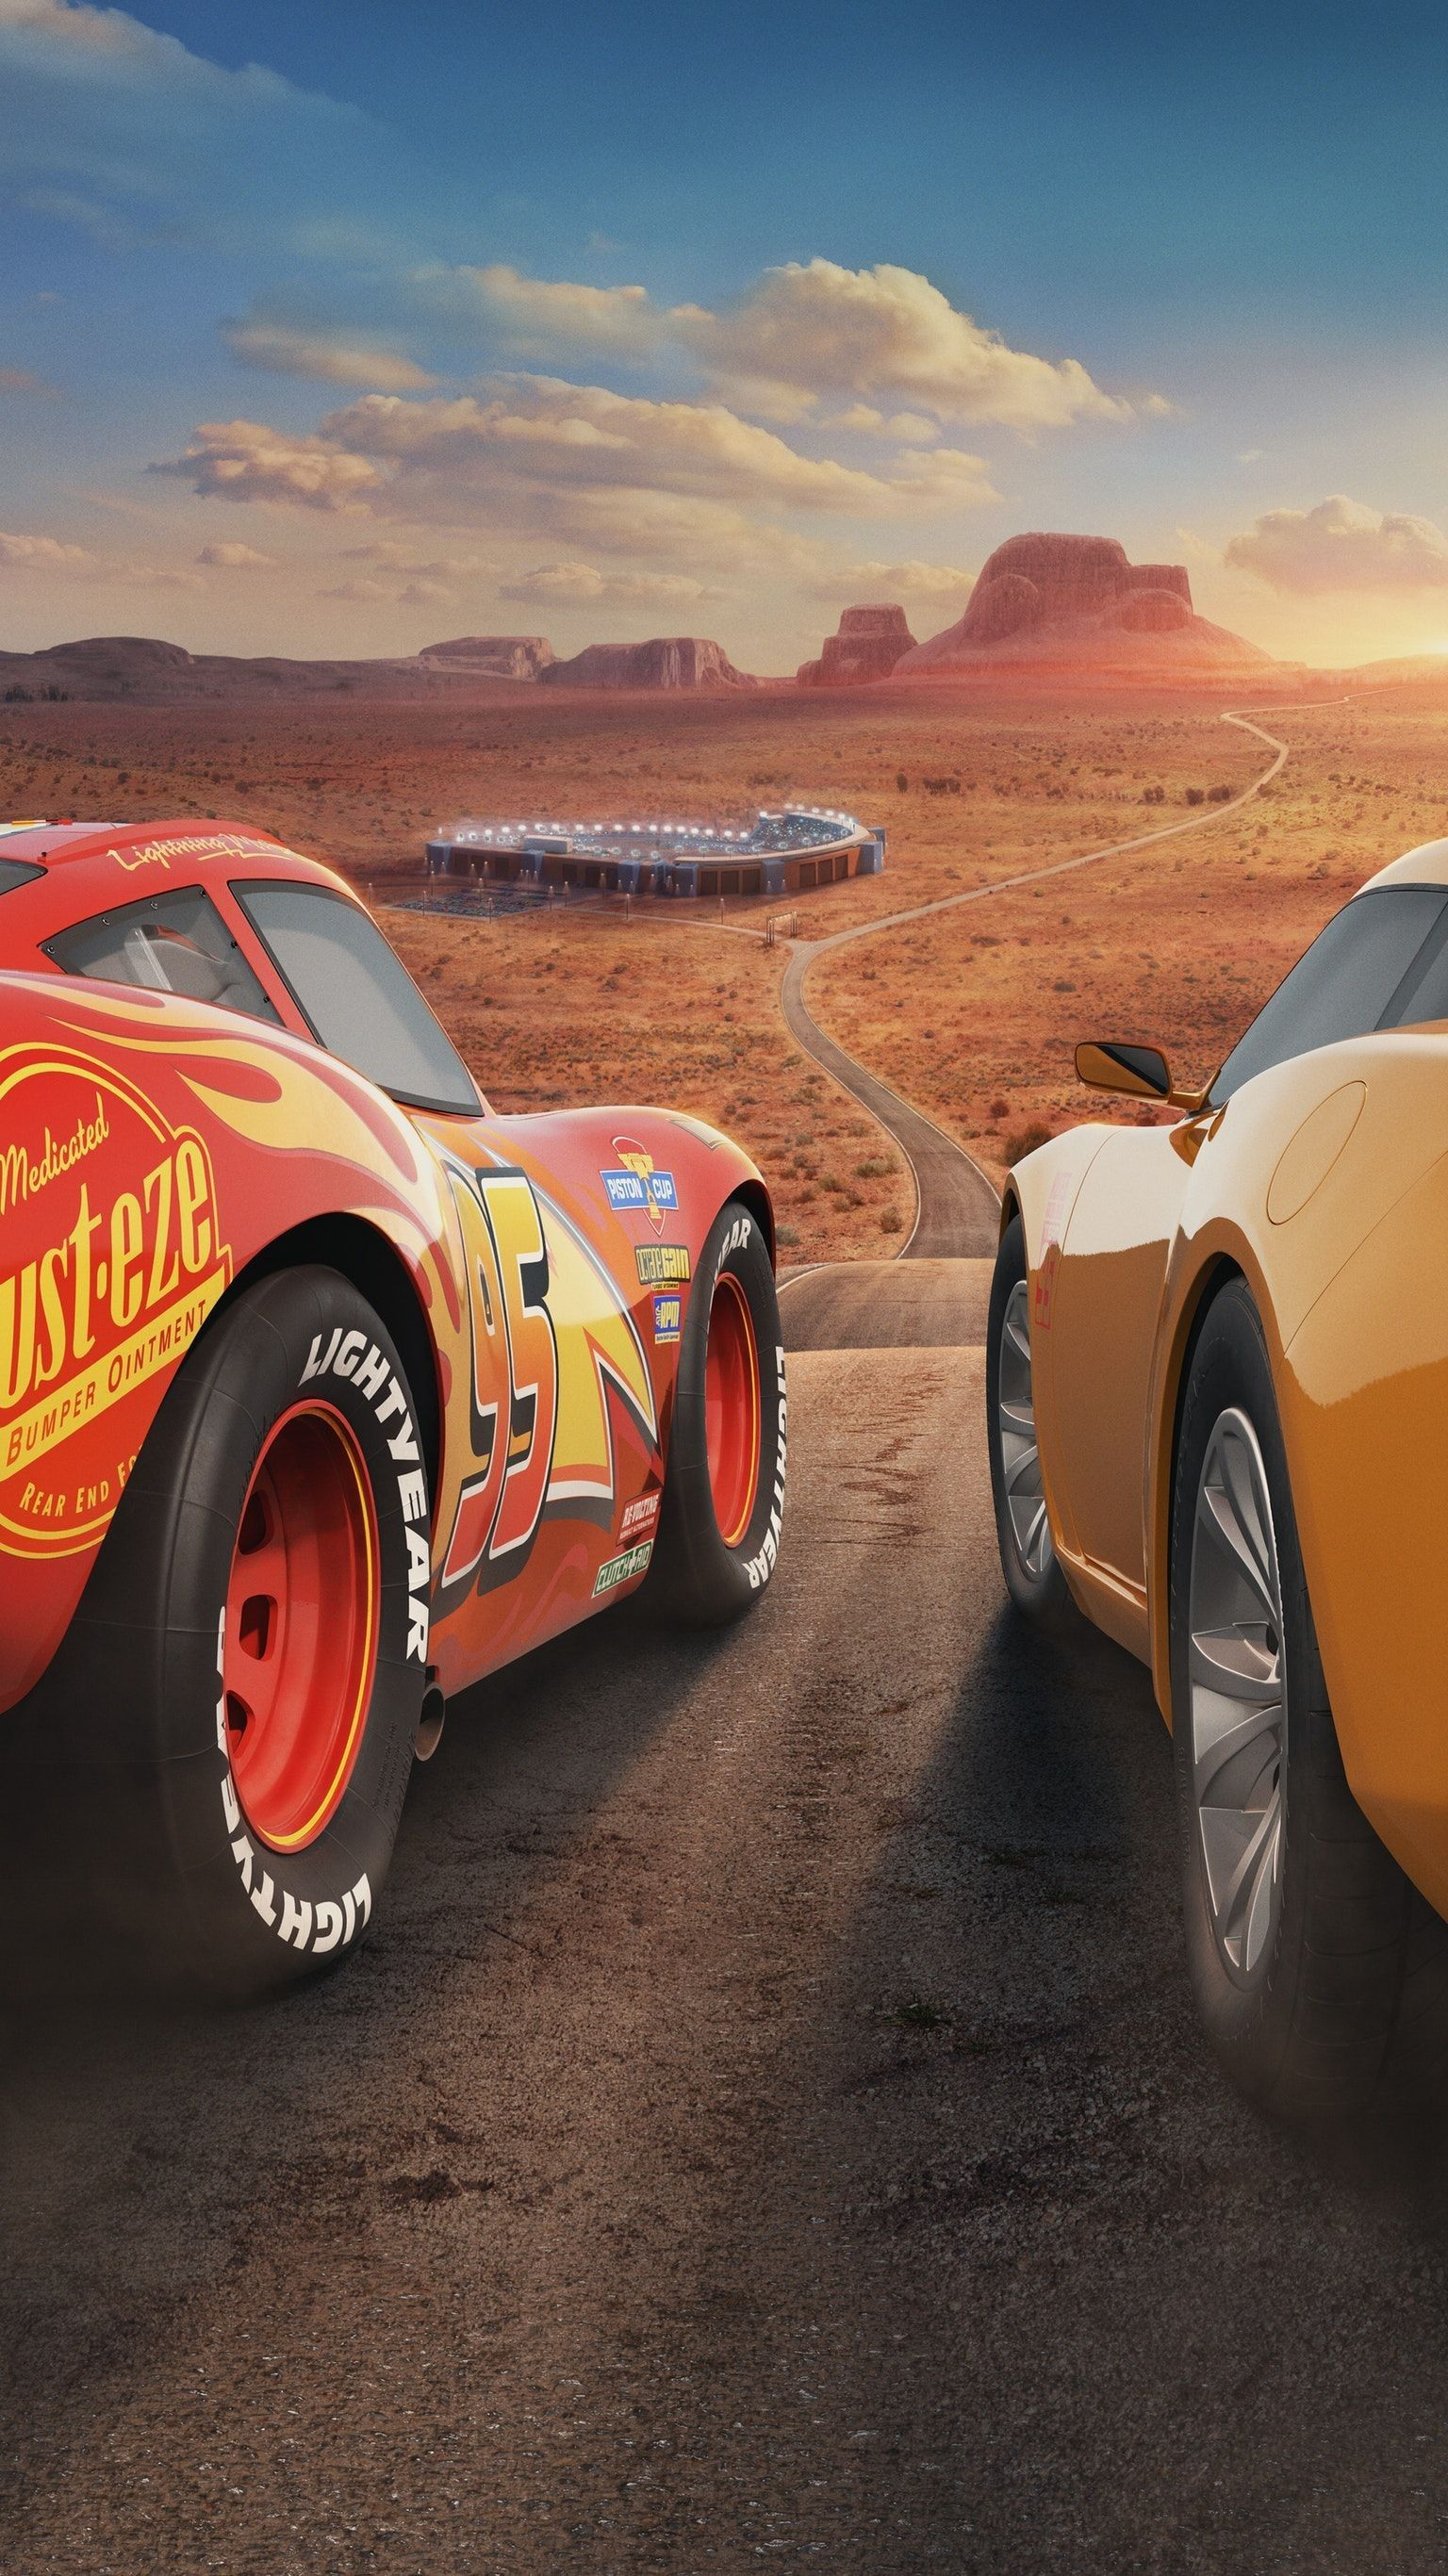 Regarder Cars 3 En Streaming Gratuit Check More At Https Www Nicolasbravo Info Regarder Cars 3 En Streamin Disney Cars Wallpaper Cars Movie Disney Pixar Cars